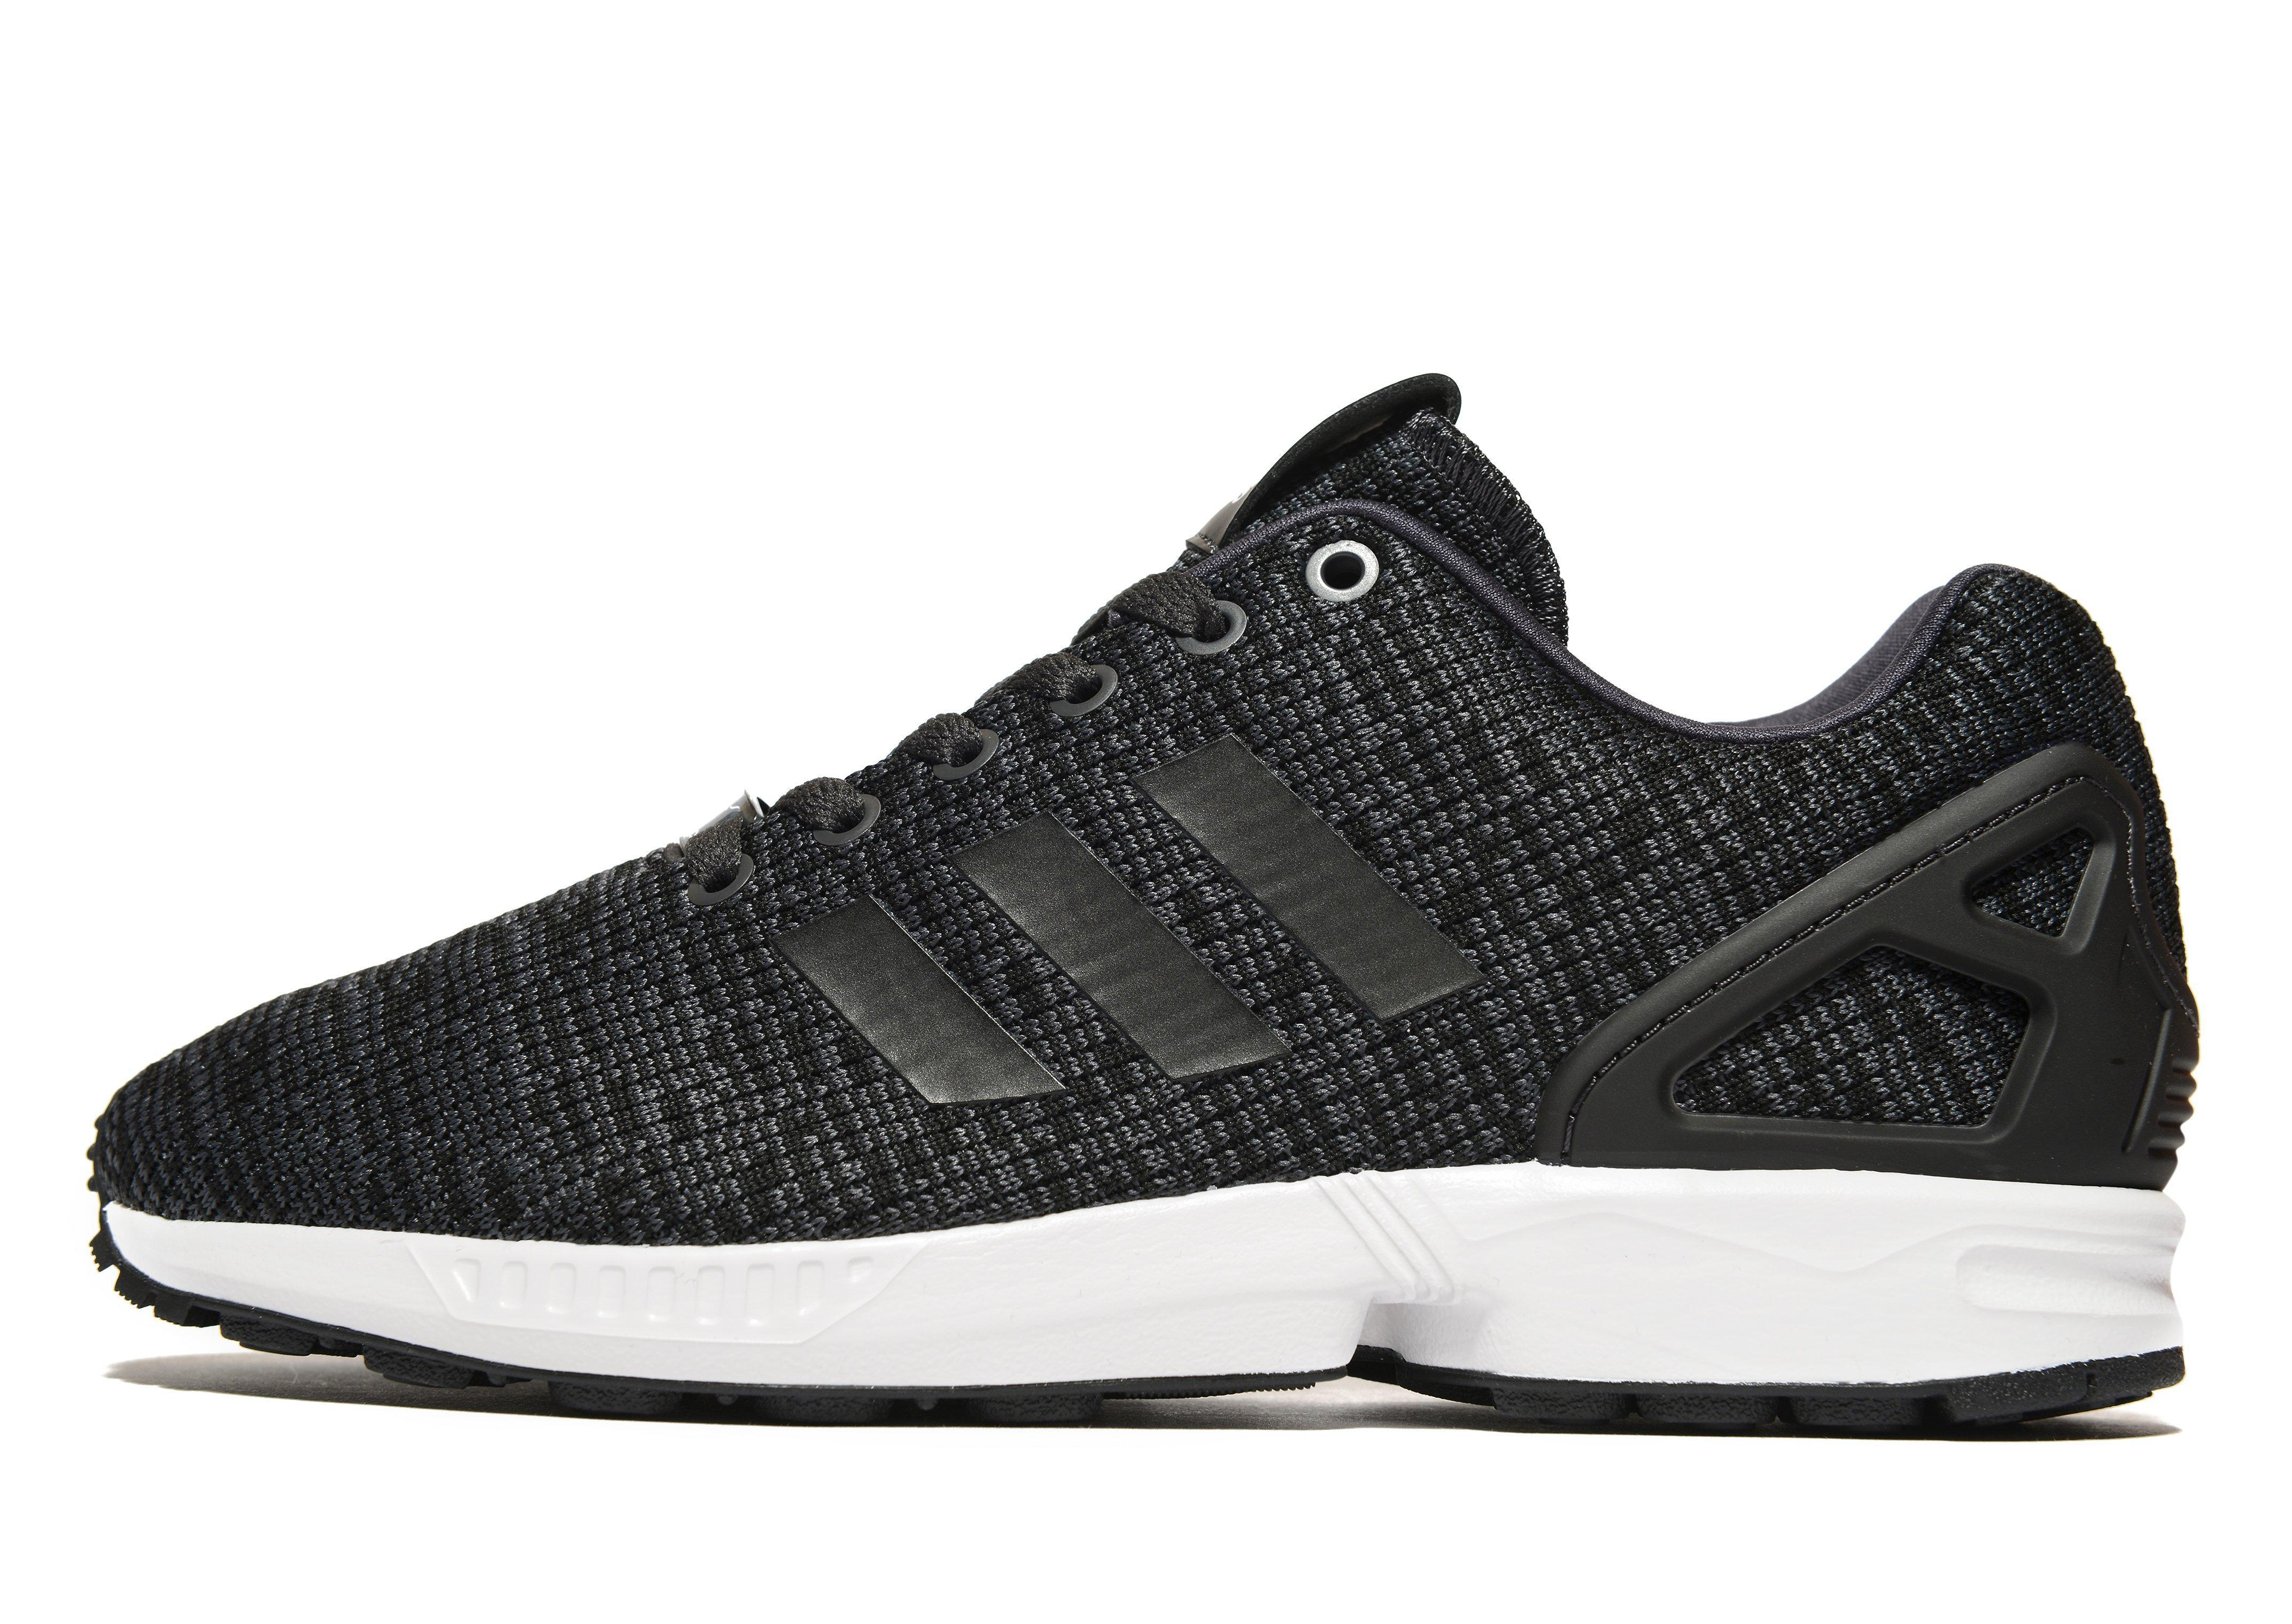 df8978cd2 Lyst - Adidas Originals Zx Flux in Black for Men